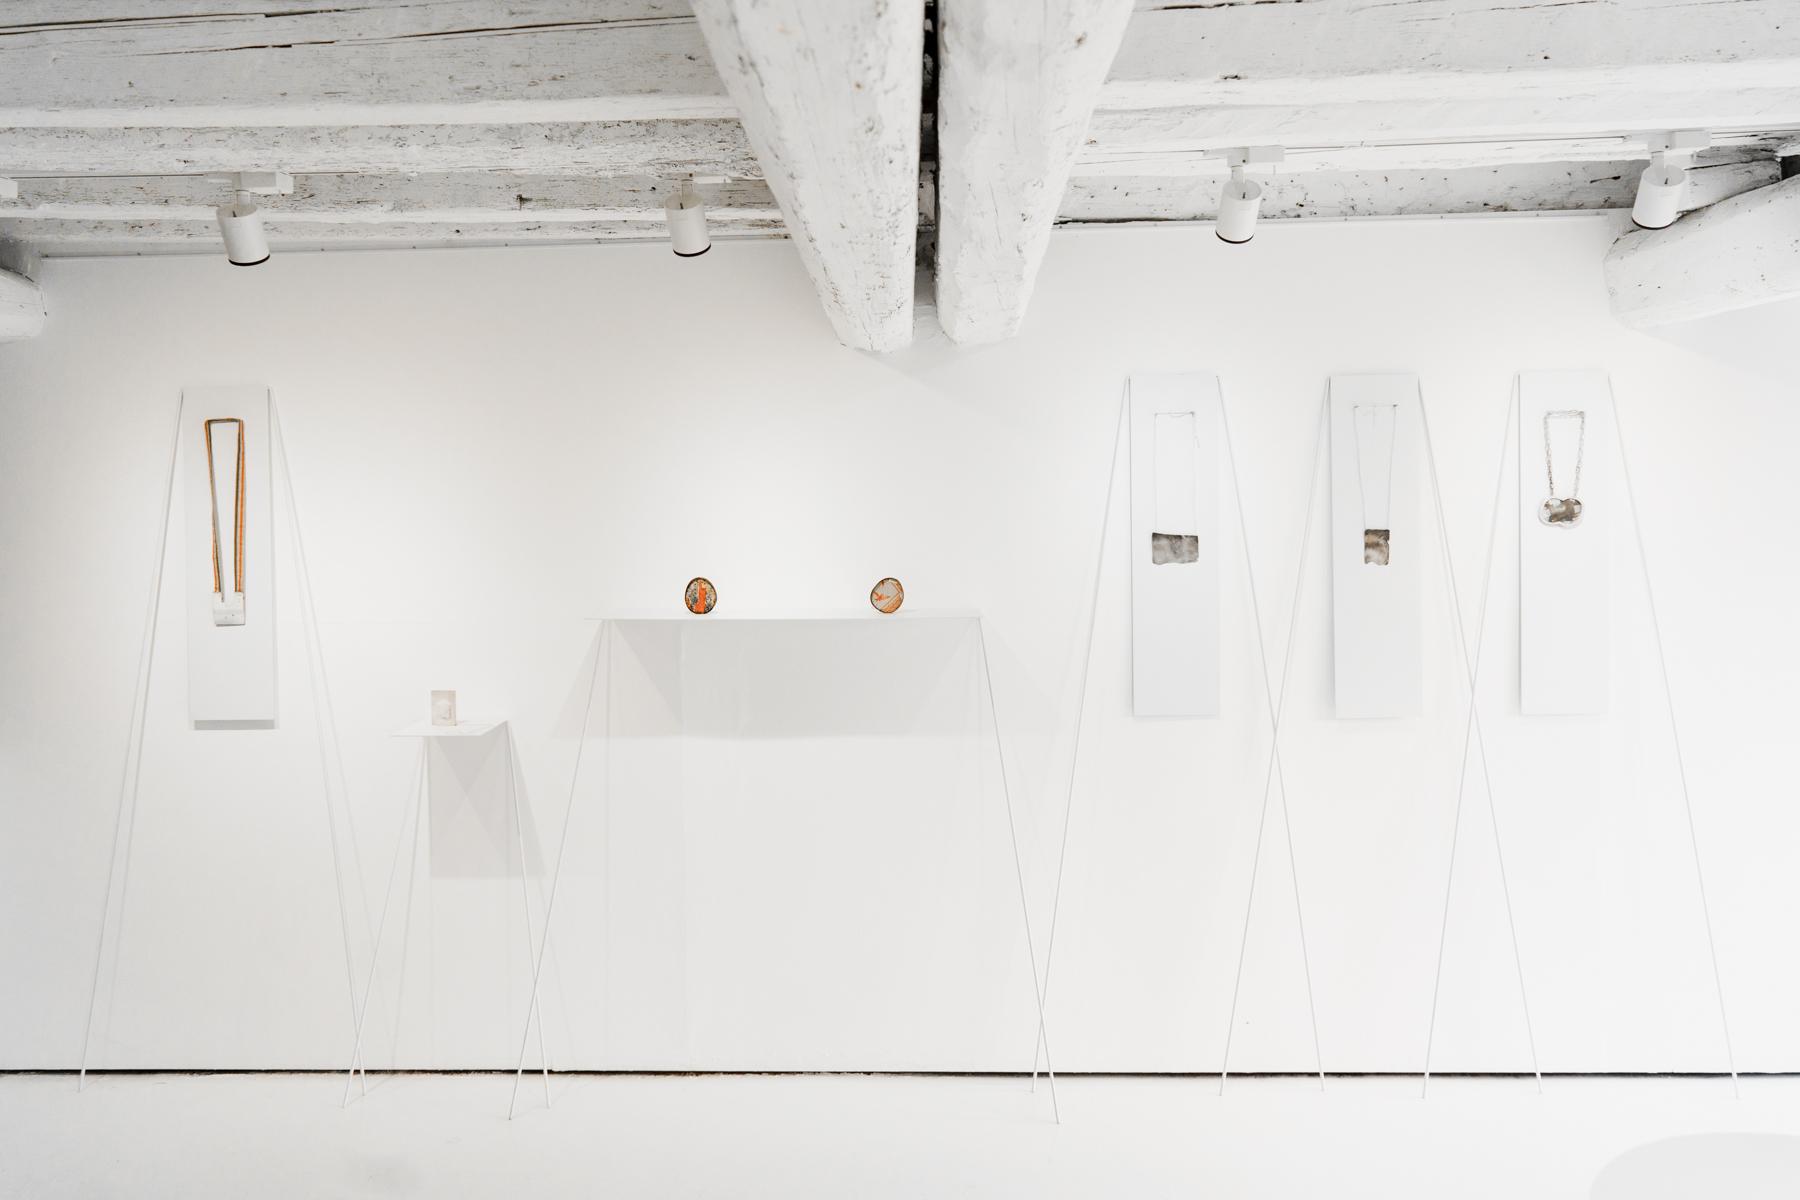 Exhibition view, Isabel Dammermann,  Treasuries&Transience , 2016, OHMYBLUE, Venice, Italy, photo: Riccardo Banfi